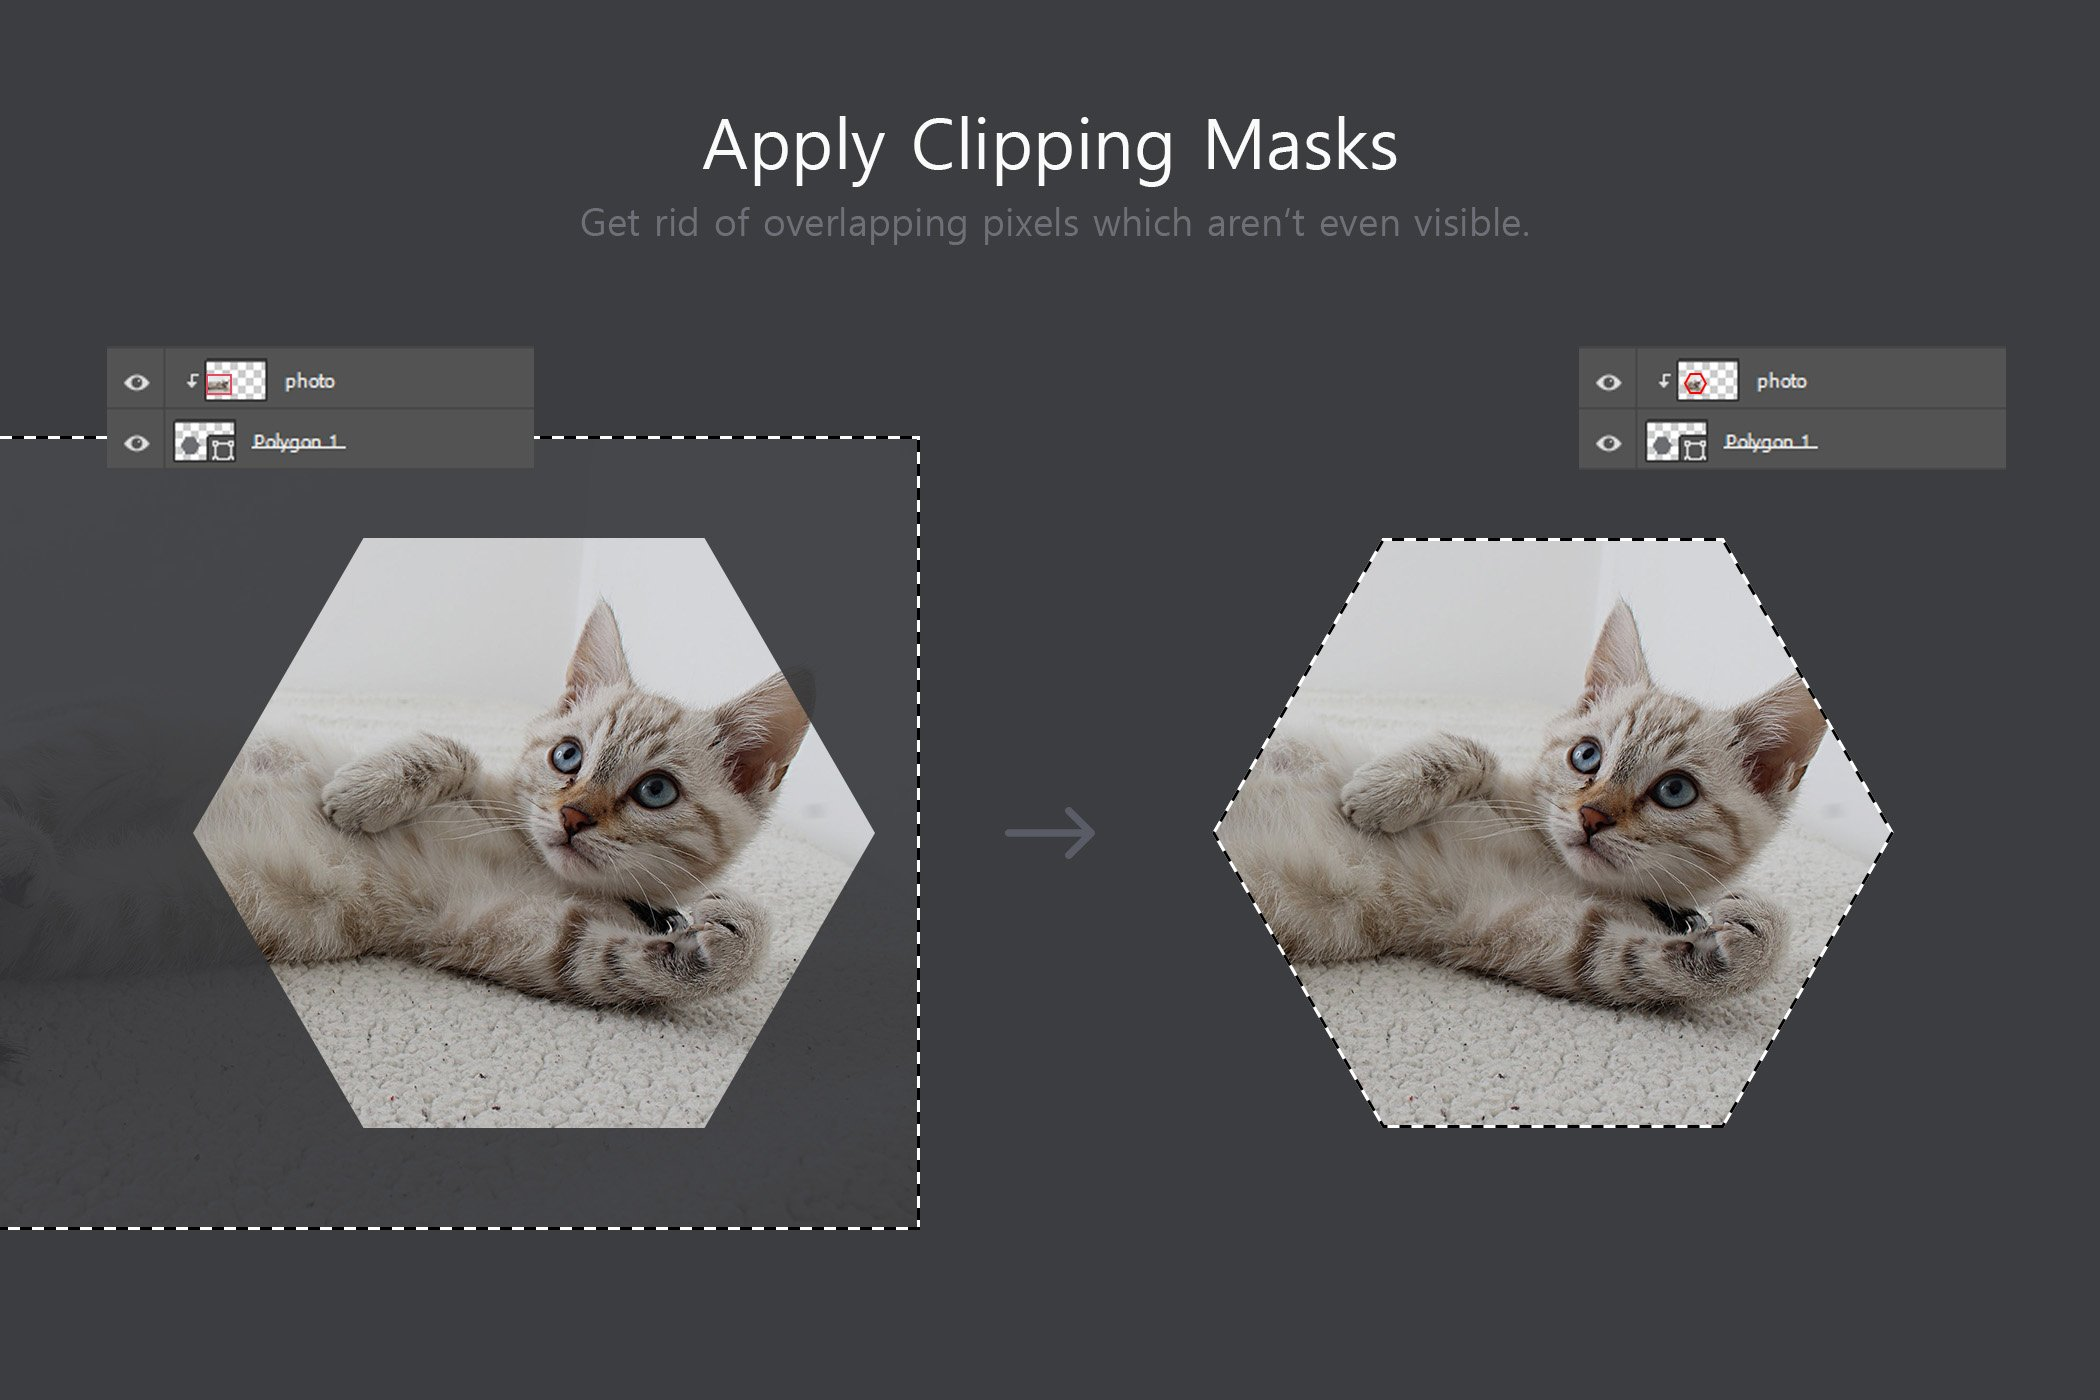 clippingmasks 6